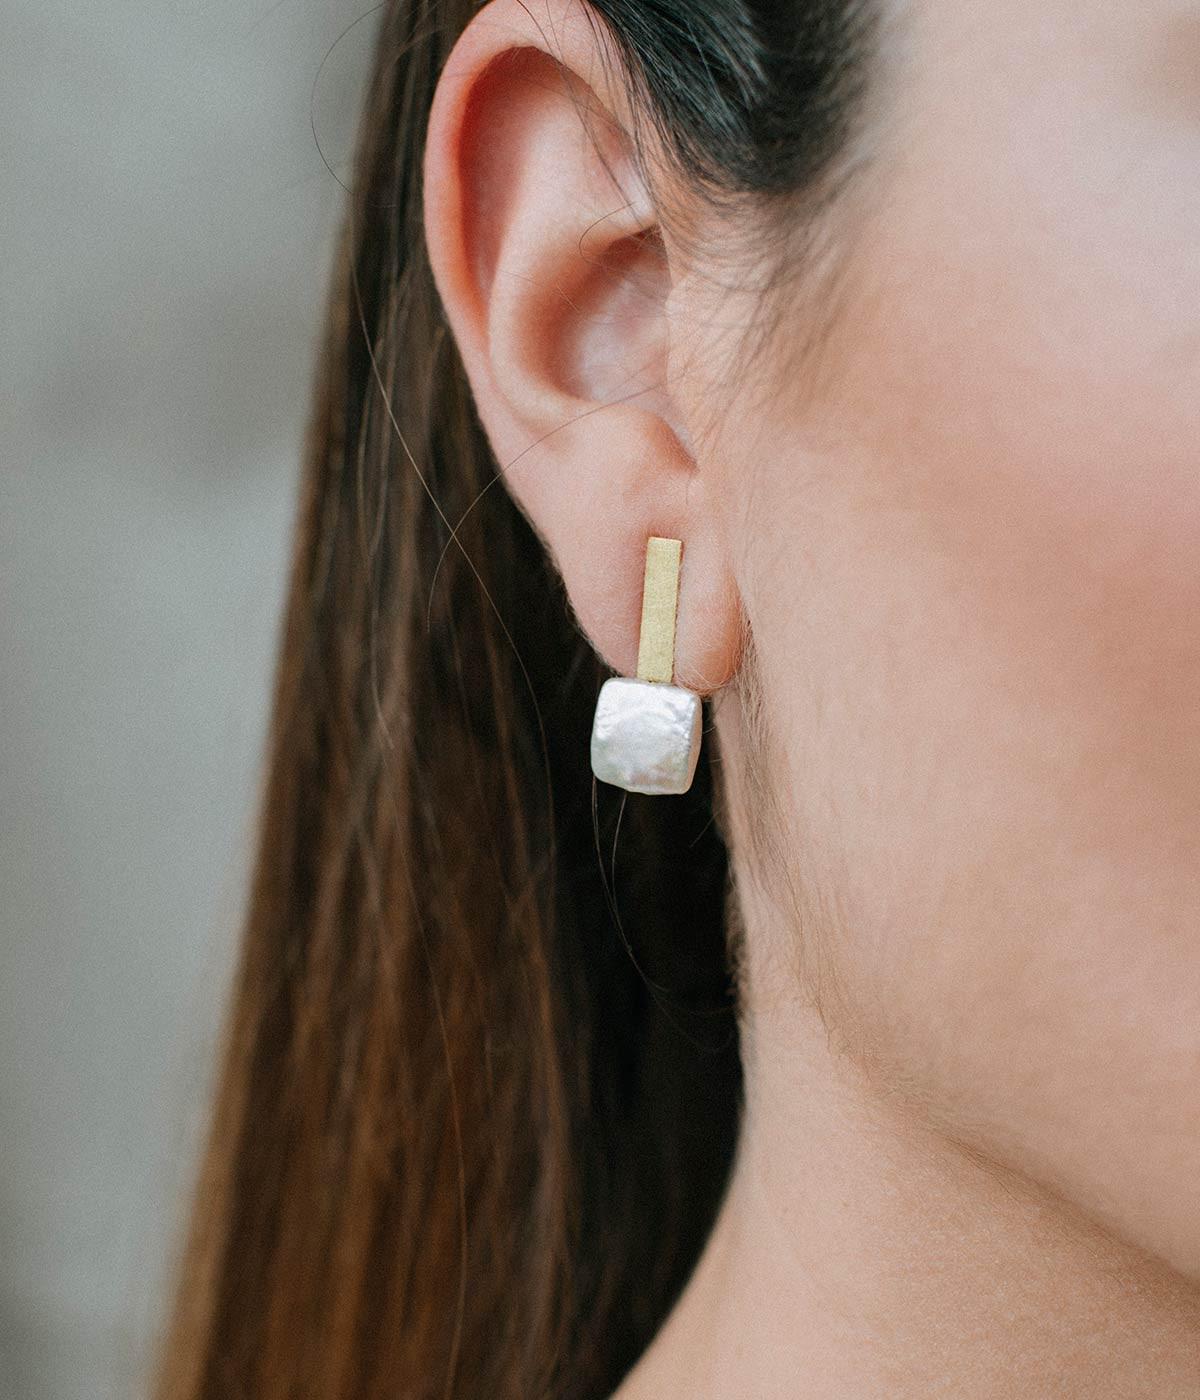 Love story earrings